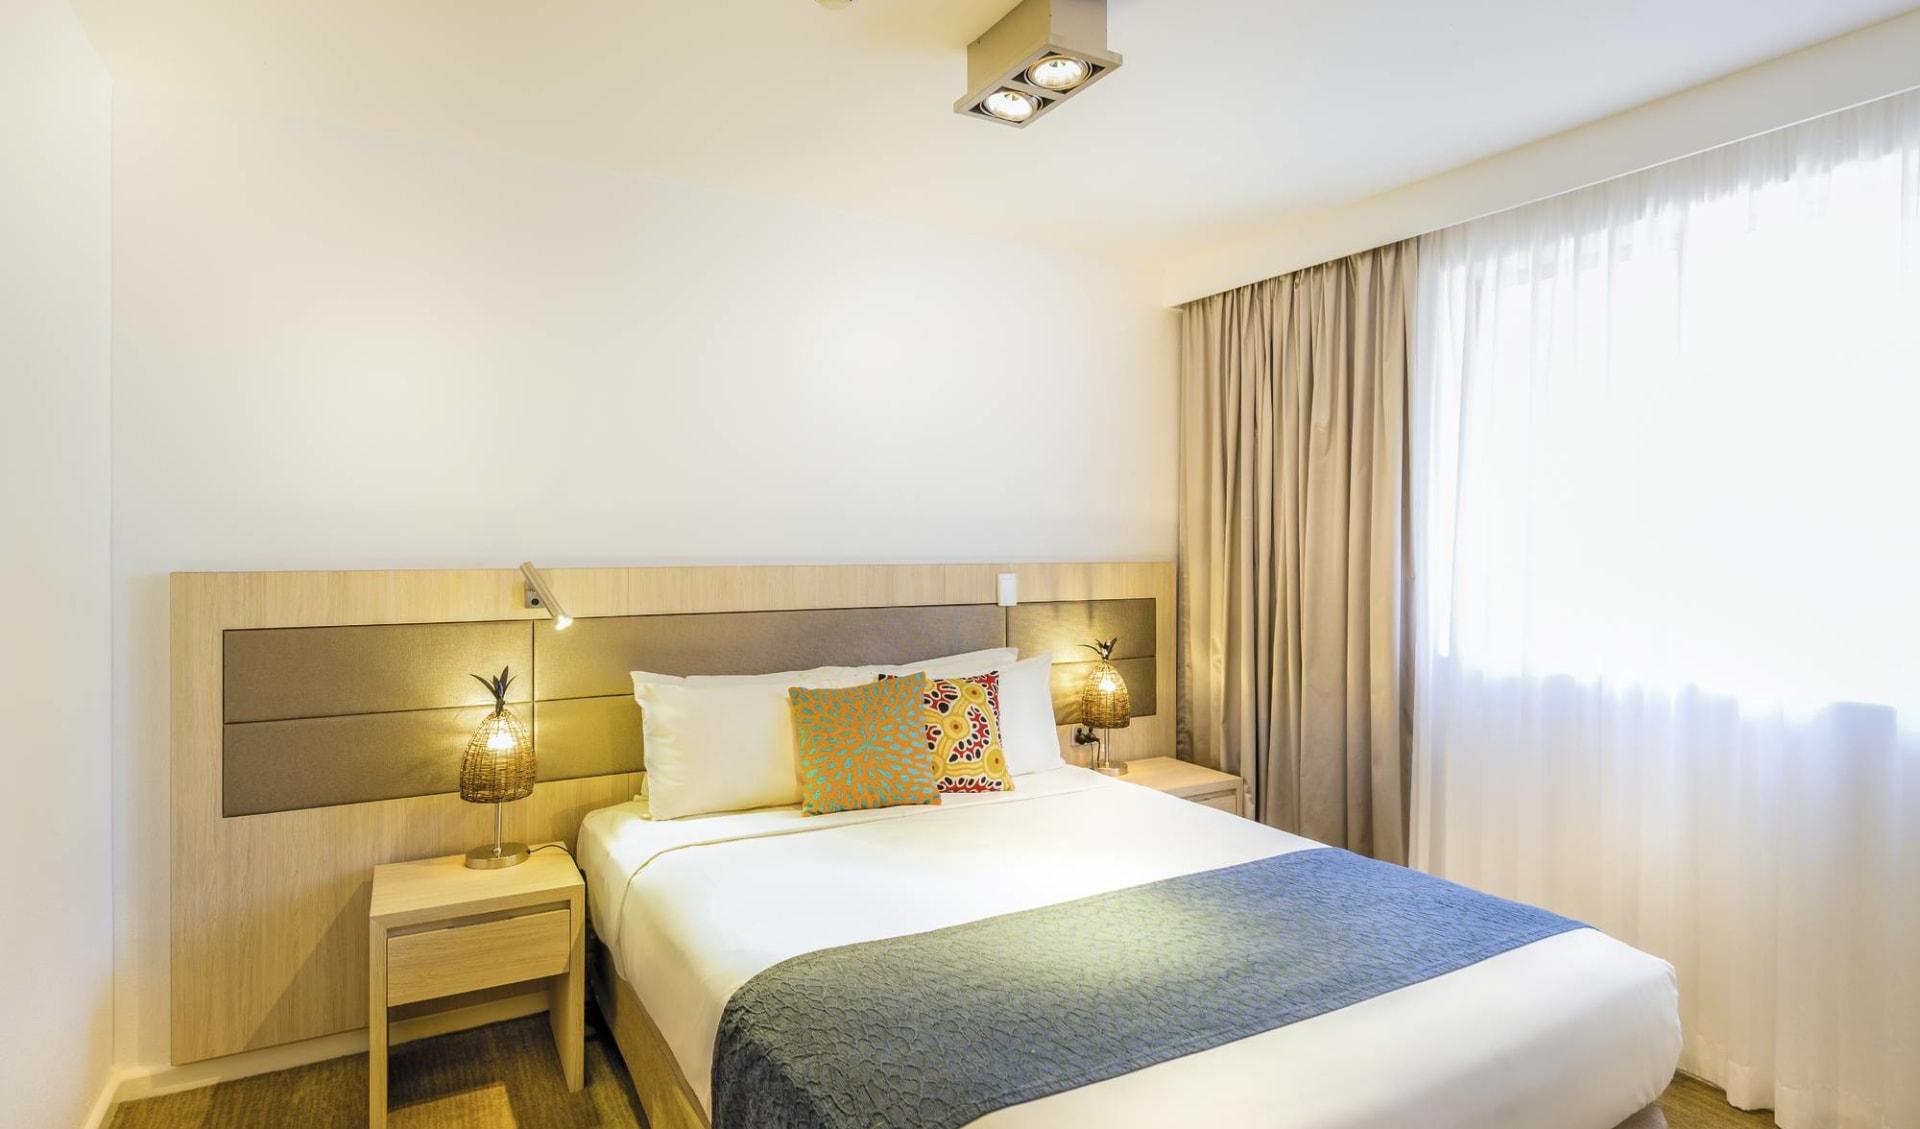 Emu Walk Apartments in Ayers Rock - Yulara:  Emu Walk Apartments - 1-Bedroom Apartment